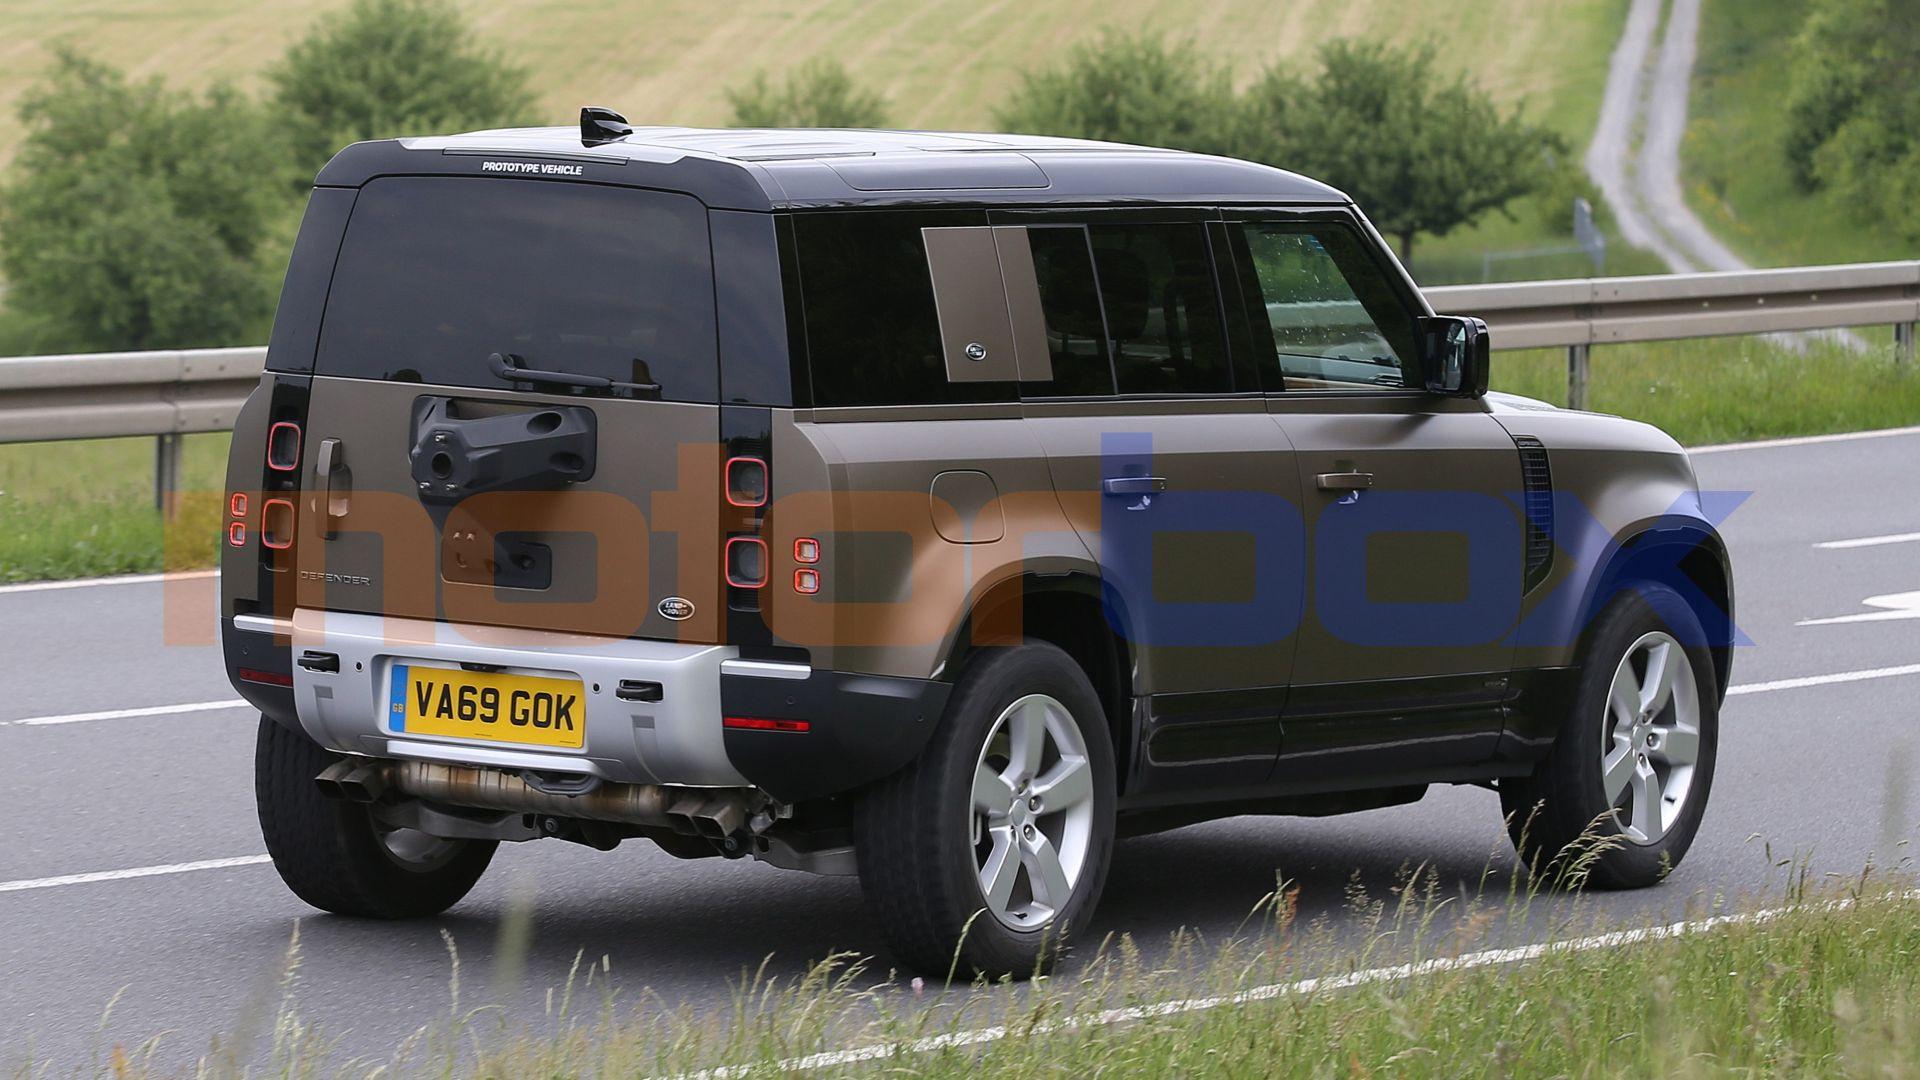 2021 Land Rover Defender V 8 - Specs, Interior Redesign ...